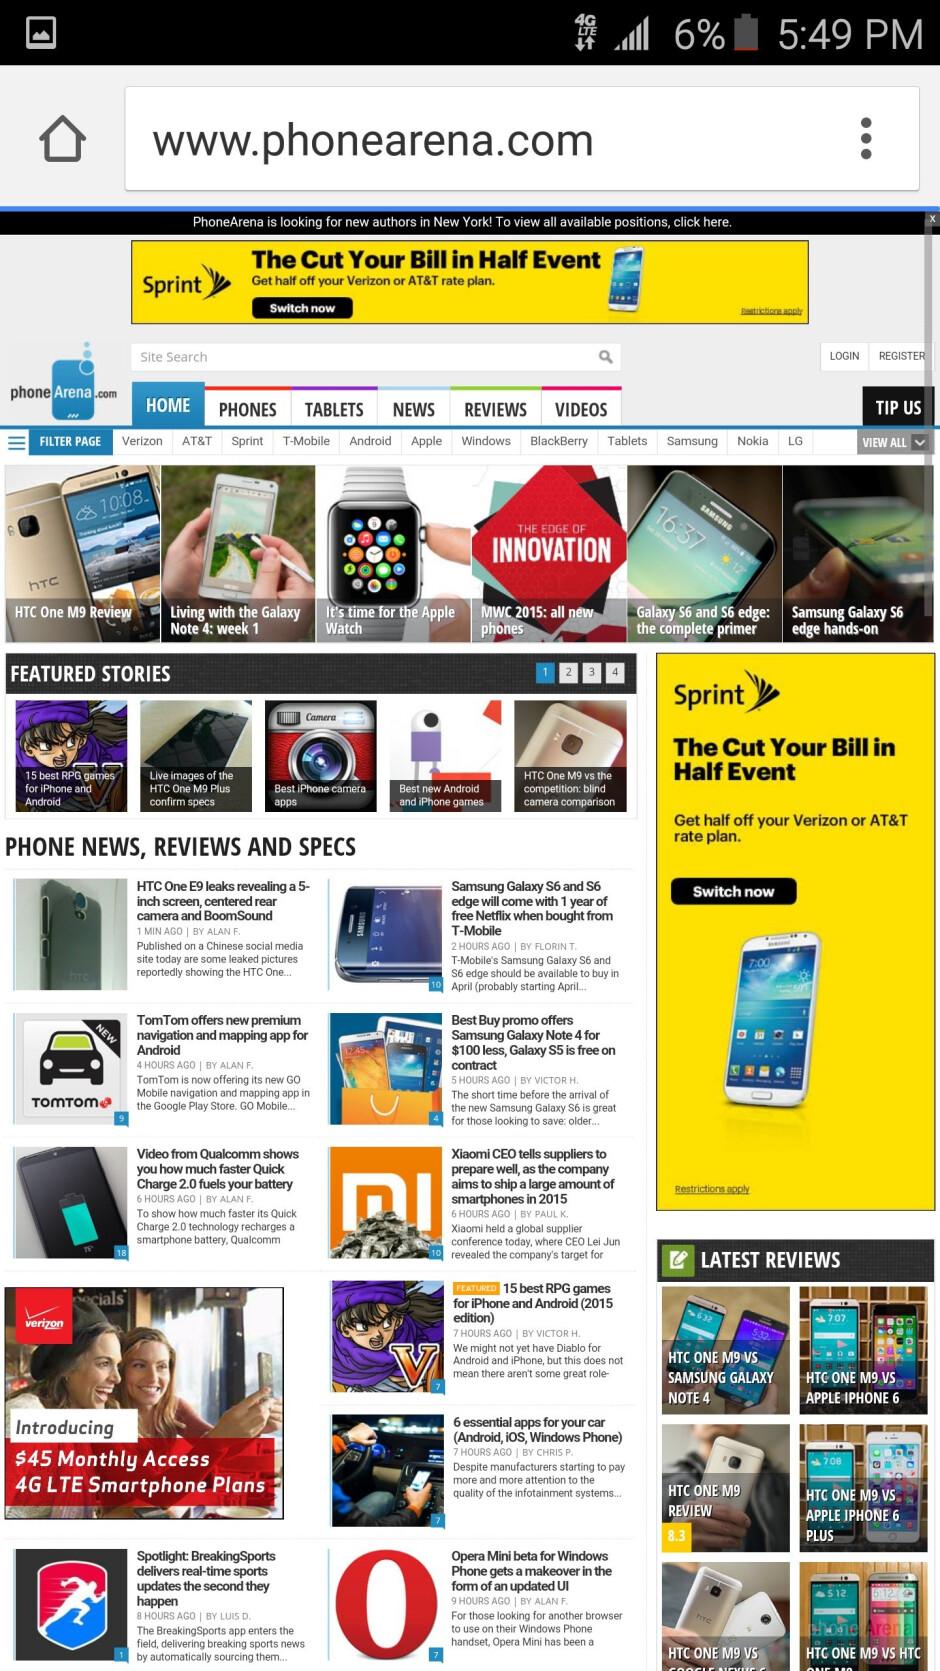 Samsung Galaxy S6 edge - Web browsing - Samsung Galaxy S6 edge vs Apple iPhone 6